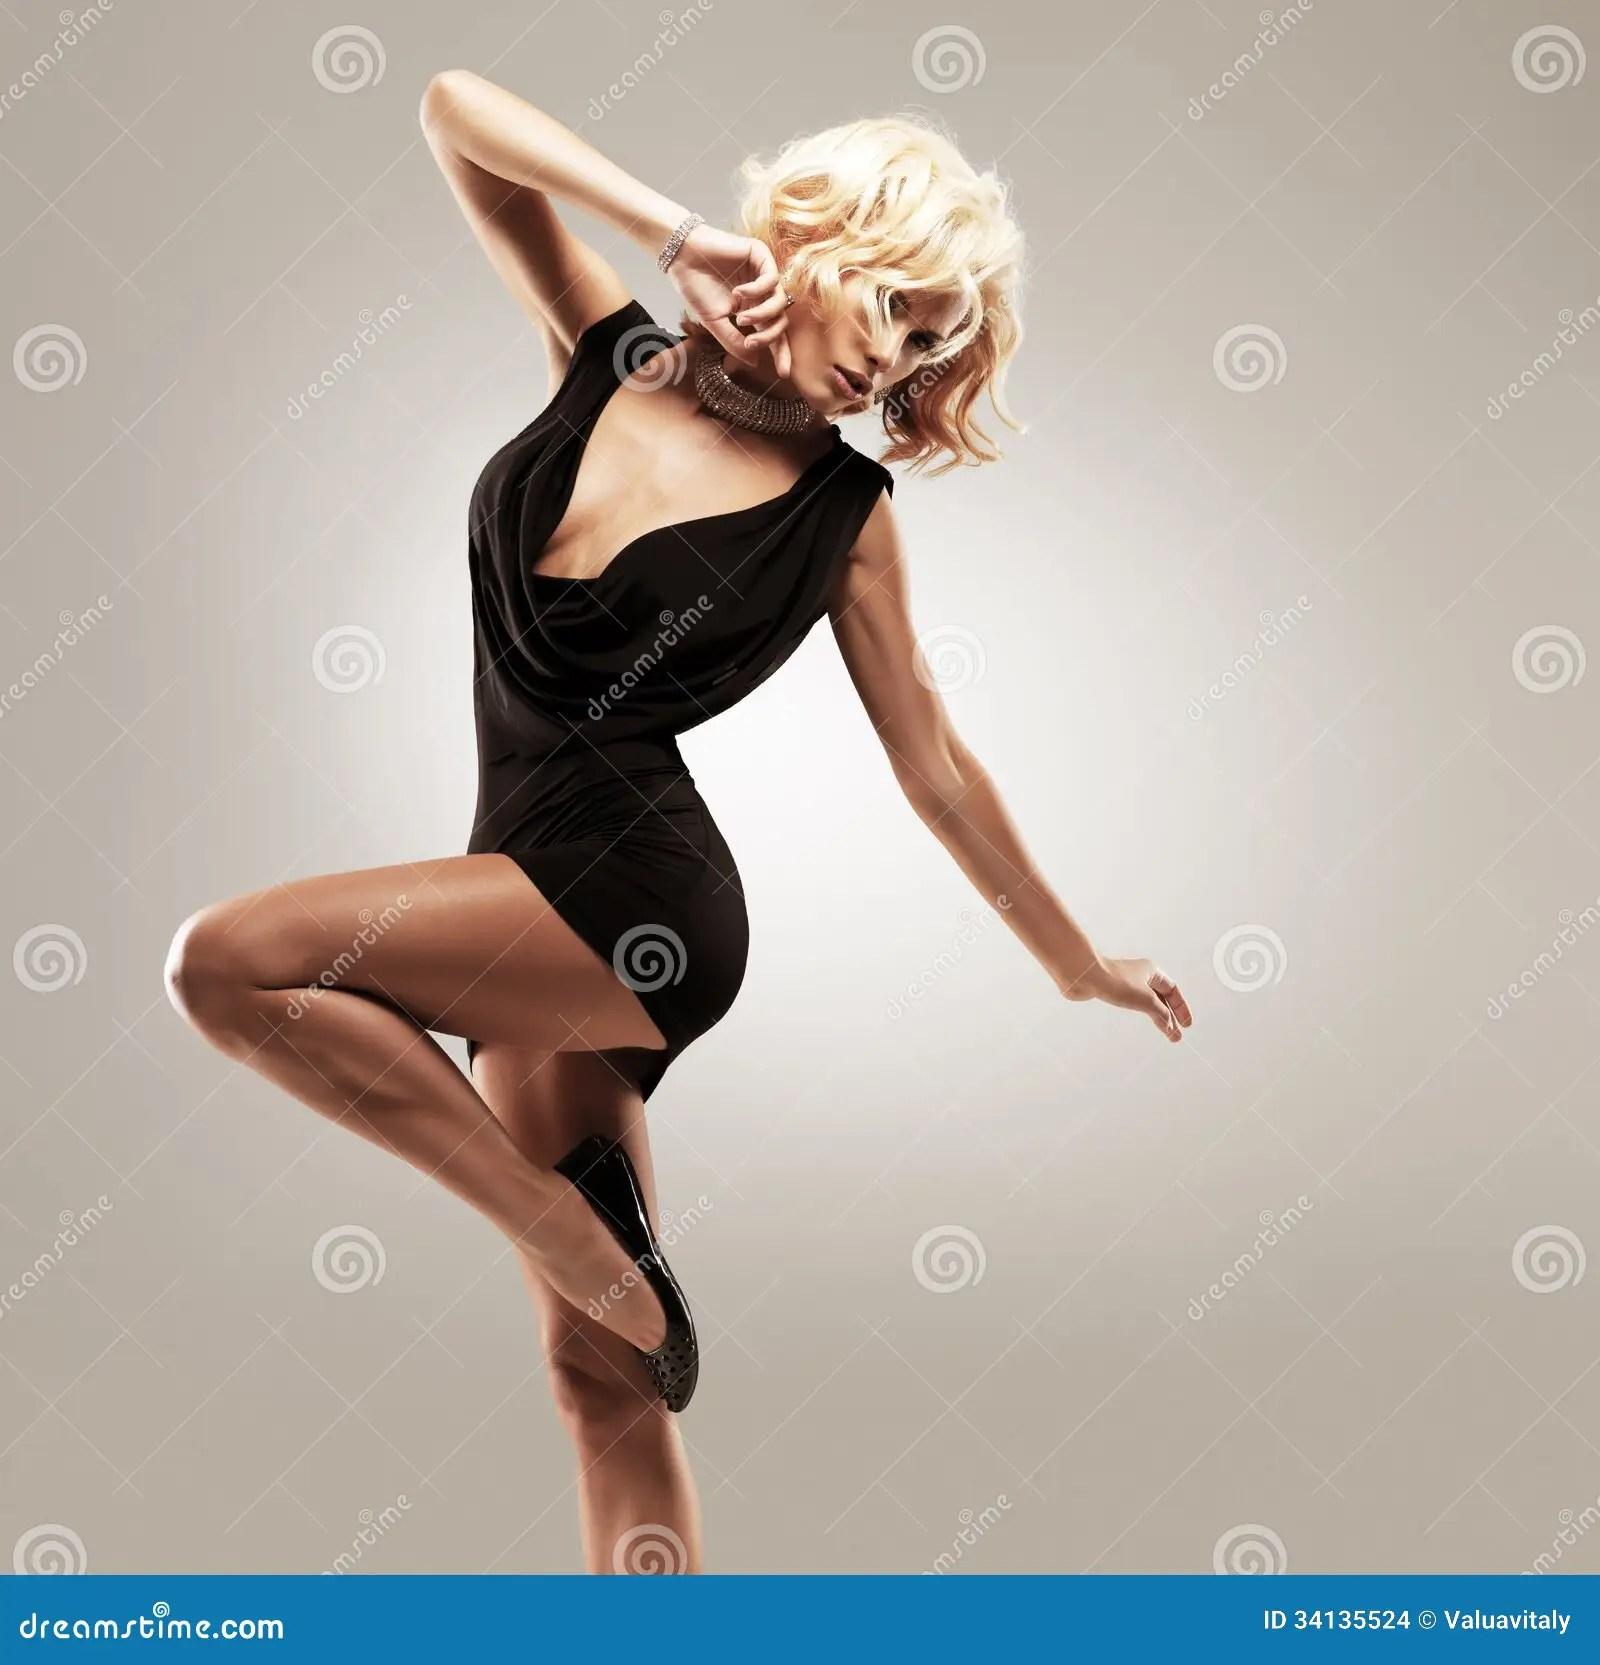 Beautiful Female Dancer In Black Dress Stock Images